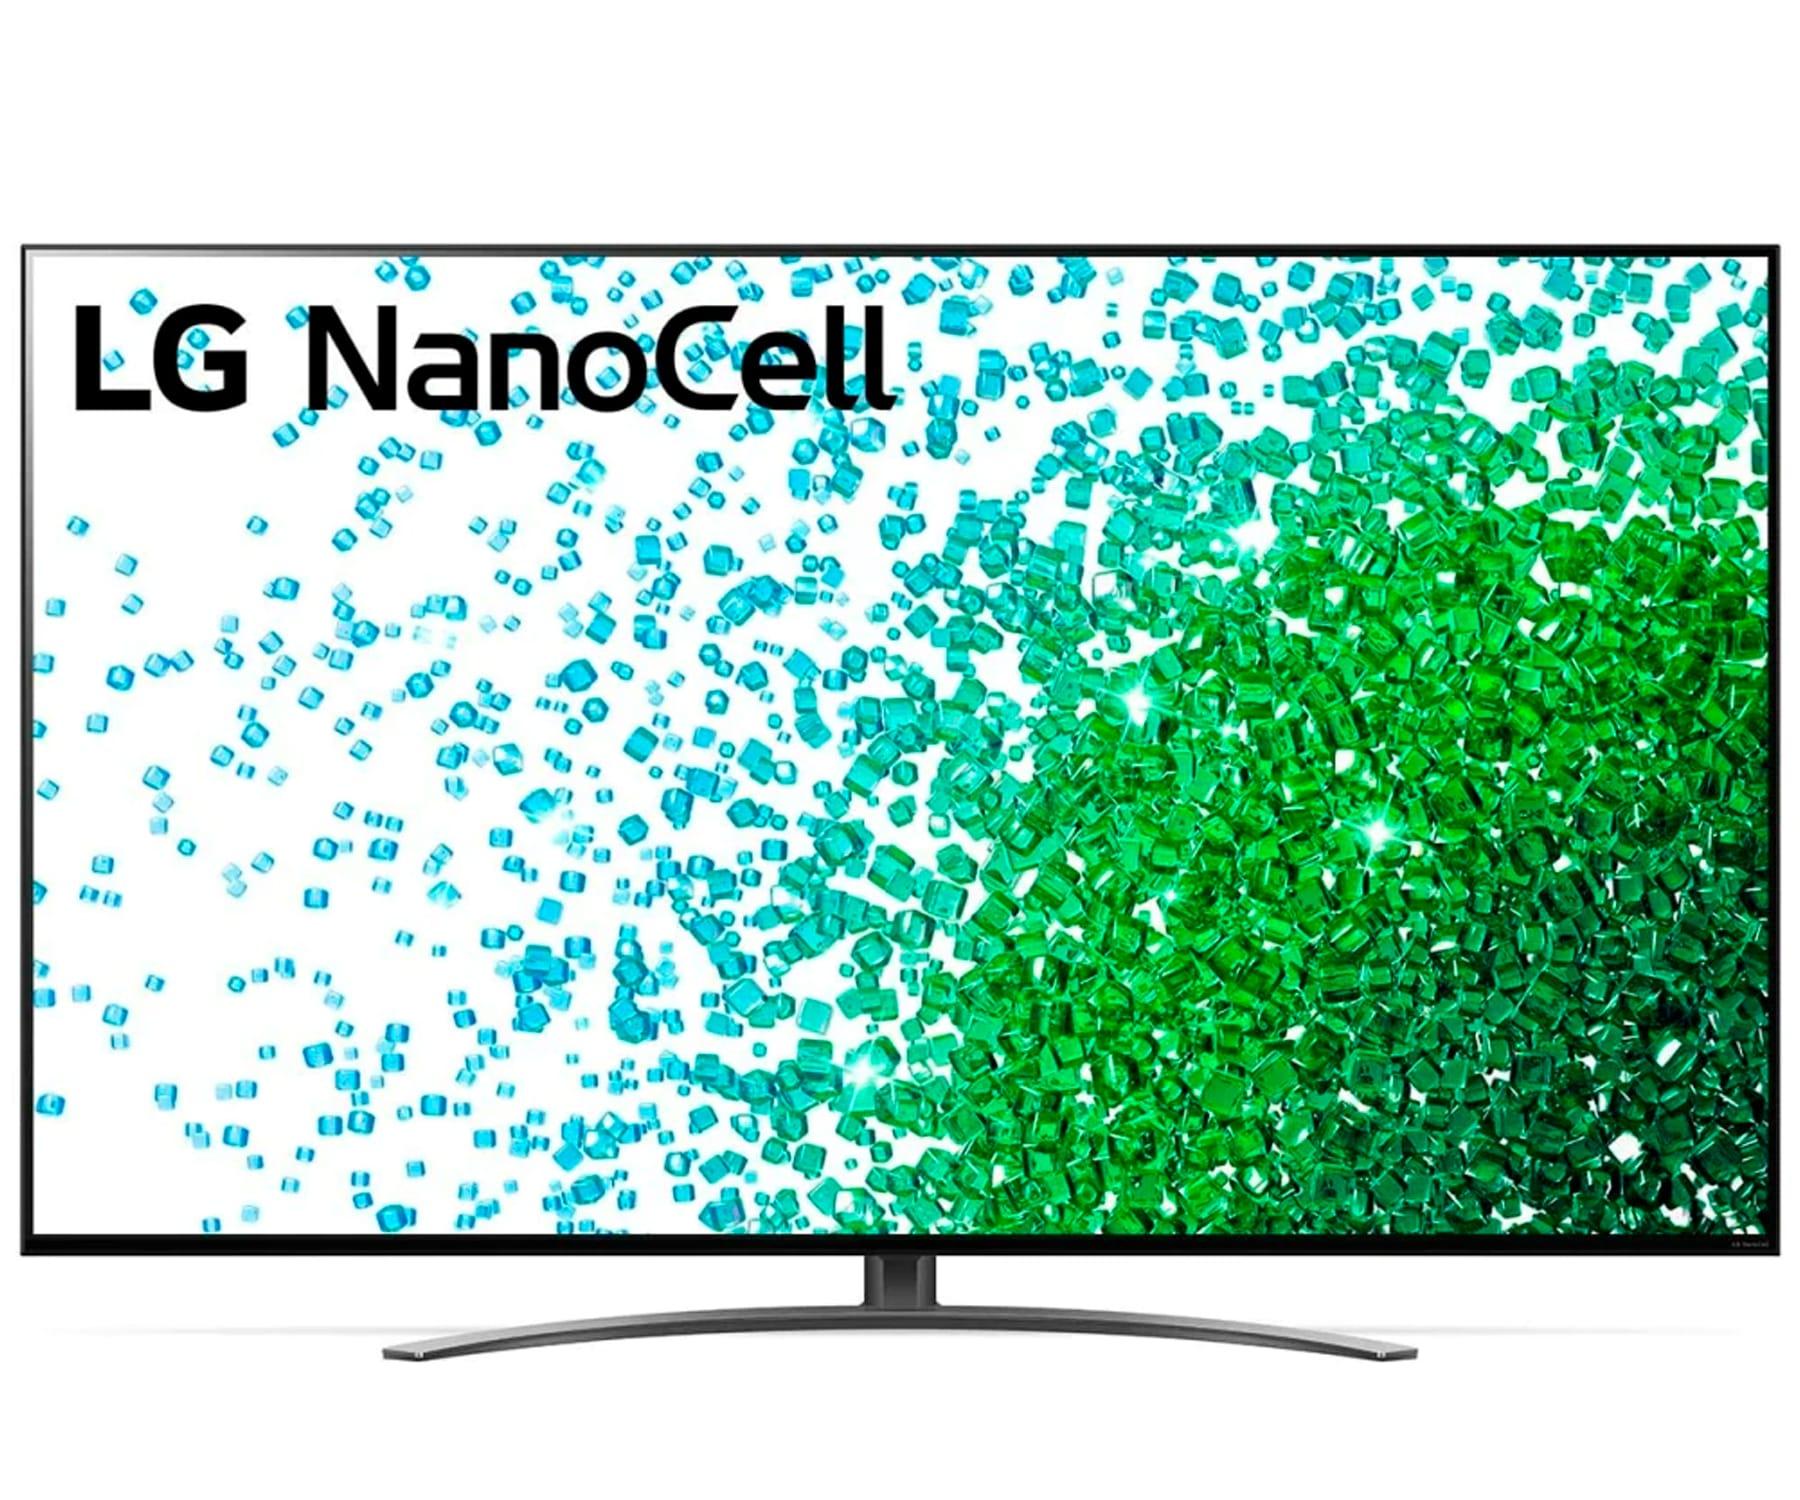 "LG 65NANO813PA TELEVISOR SMART TV 65"" NANOCELL UHD 4K HDR"